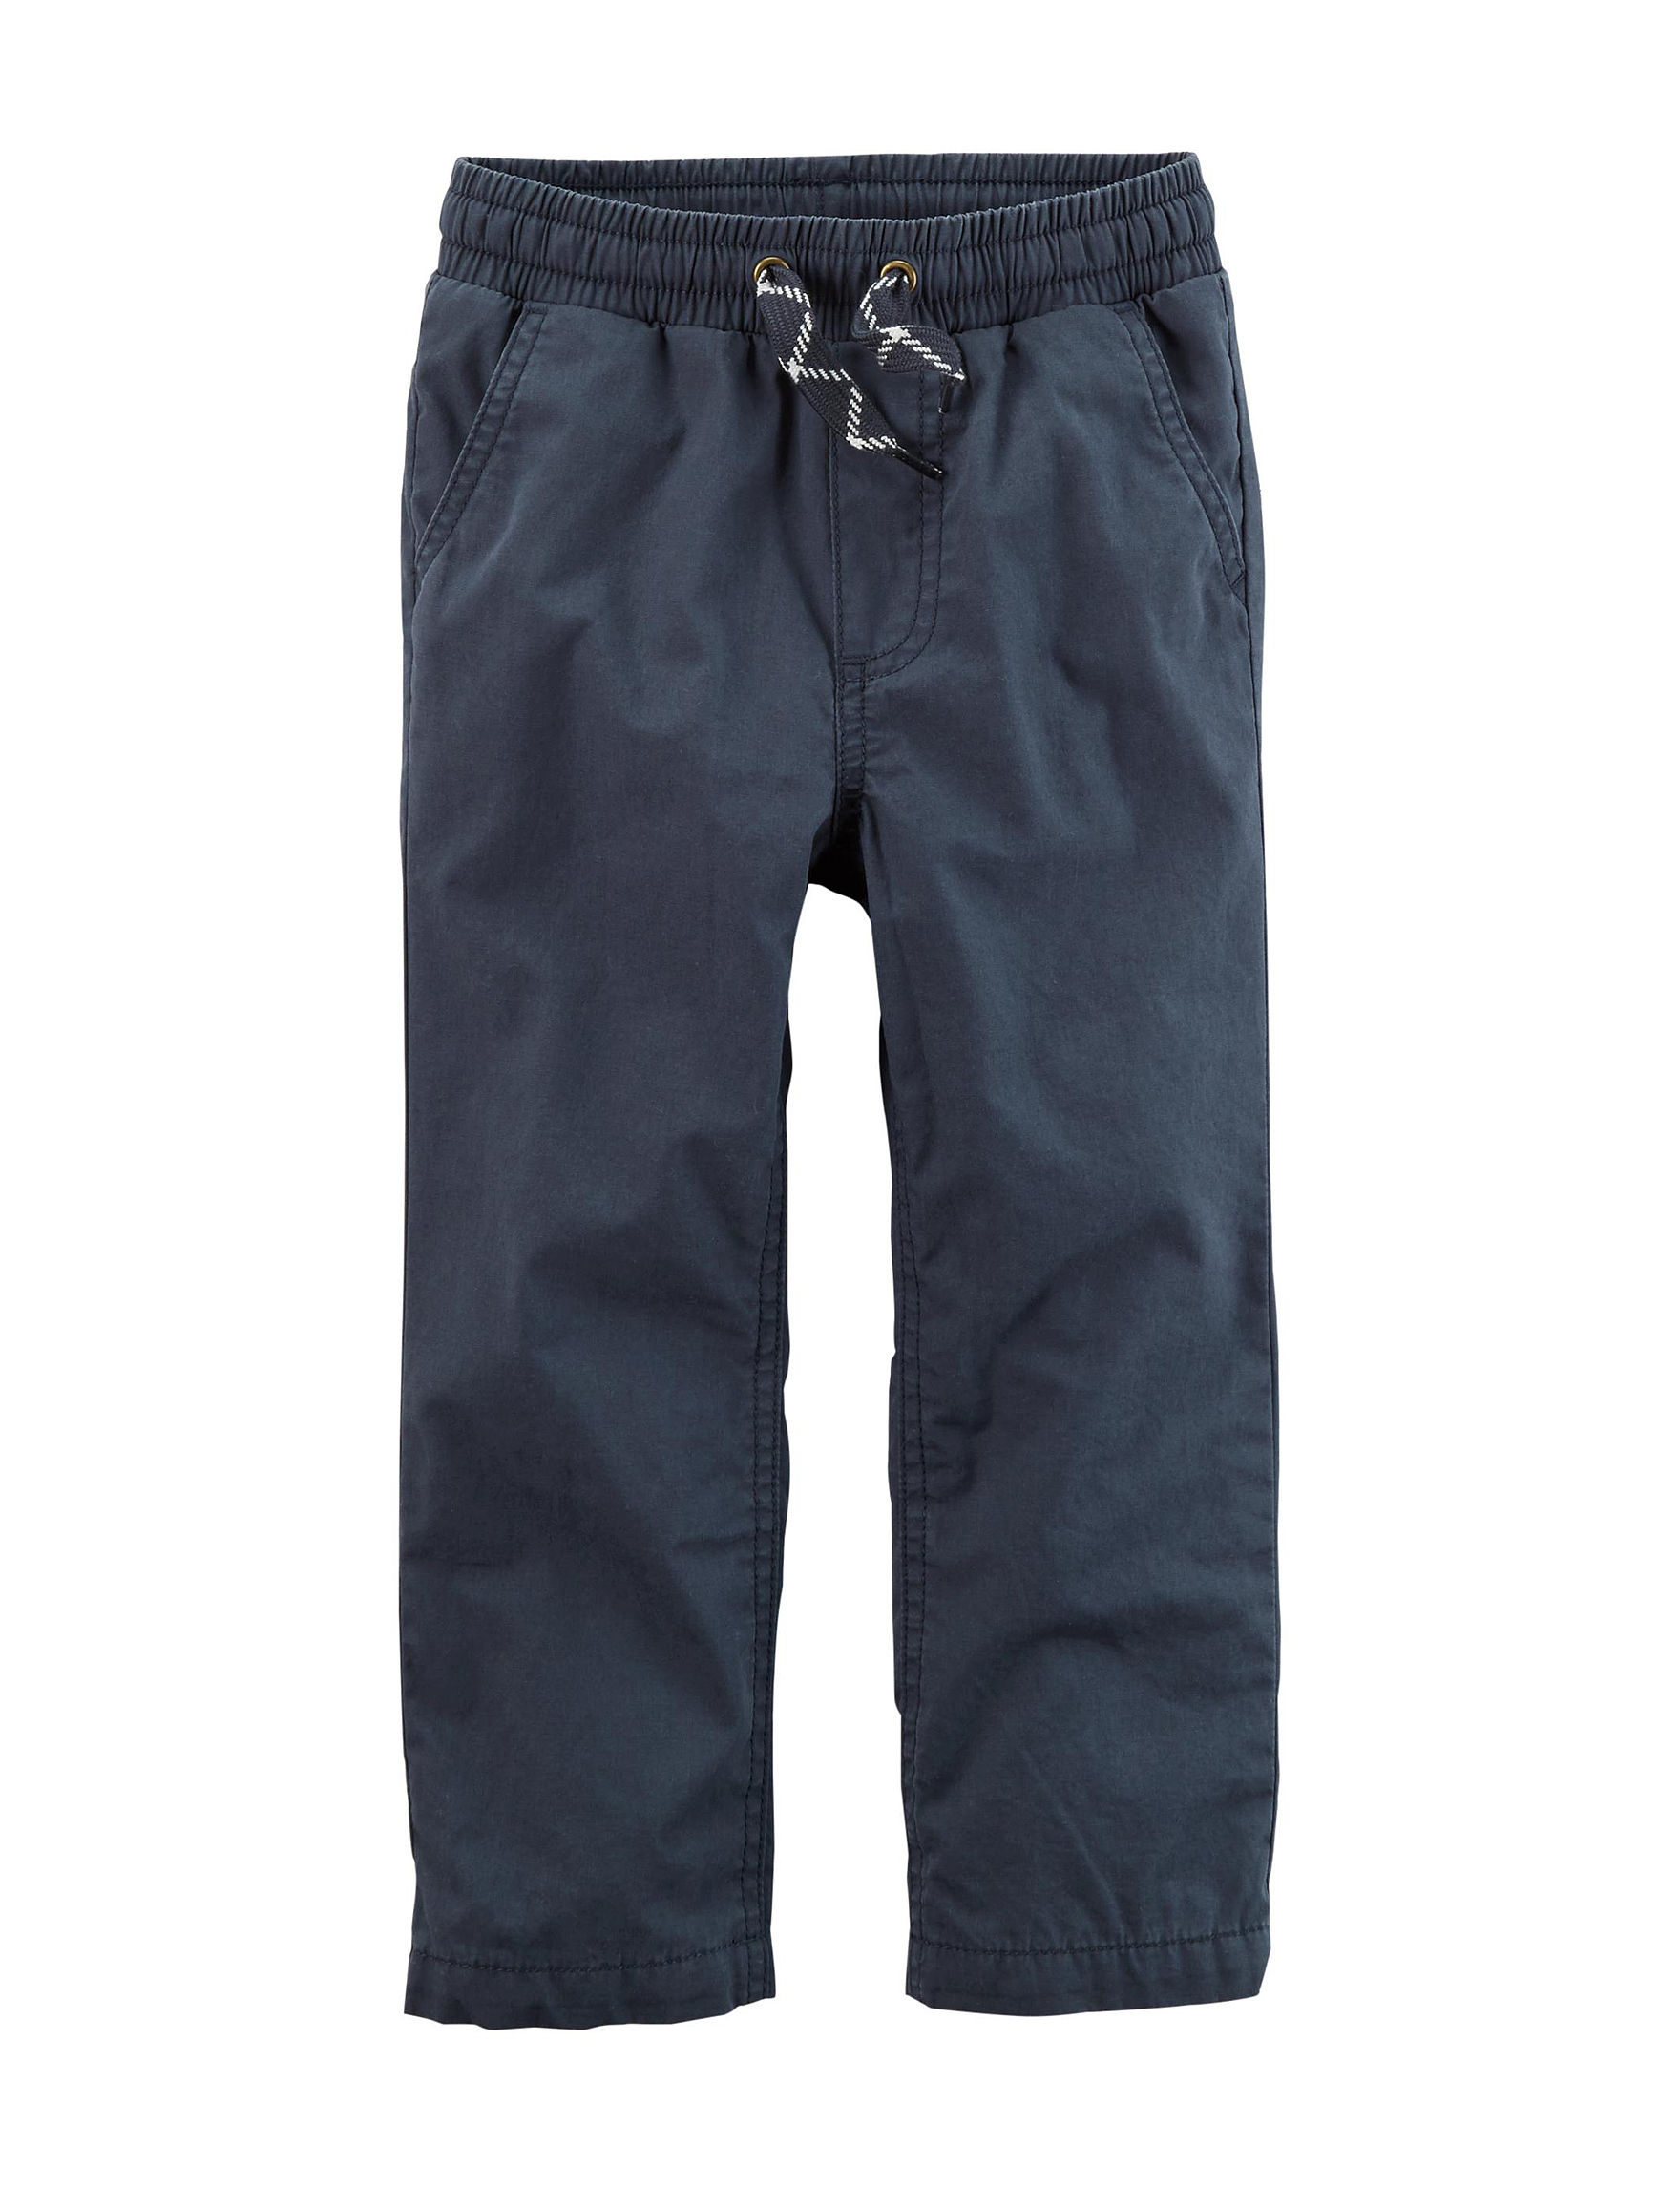 Carter's Navy Soft Pants